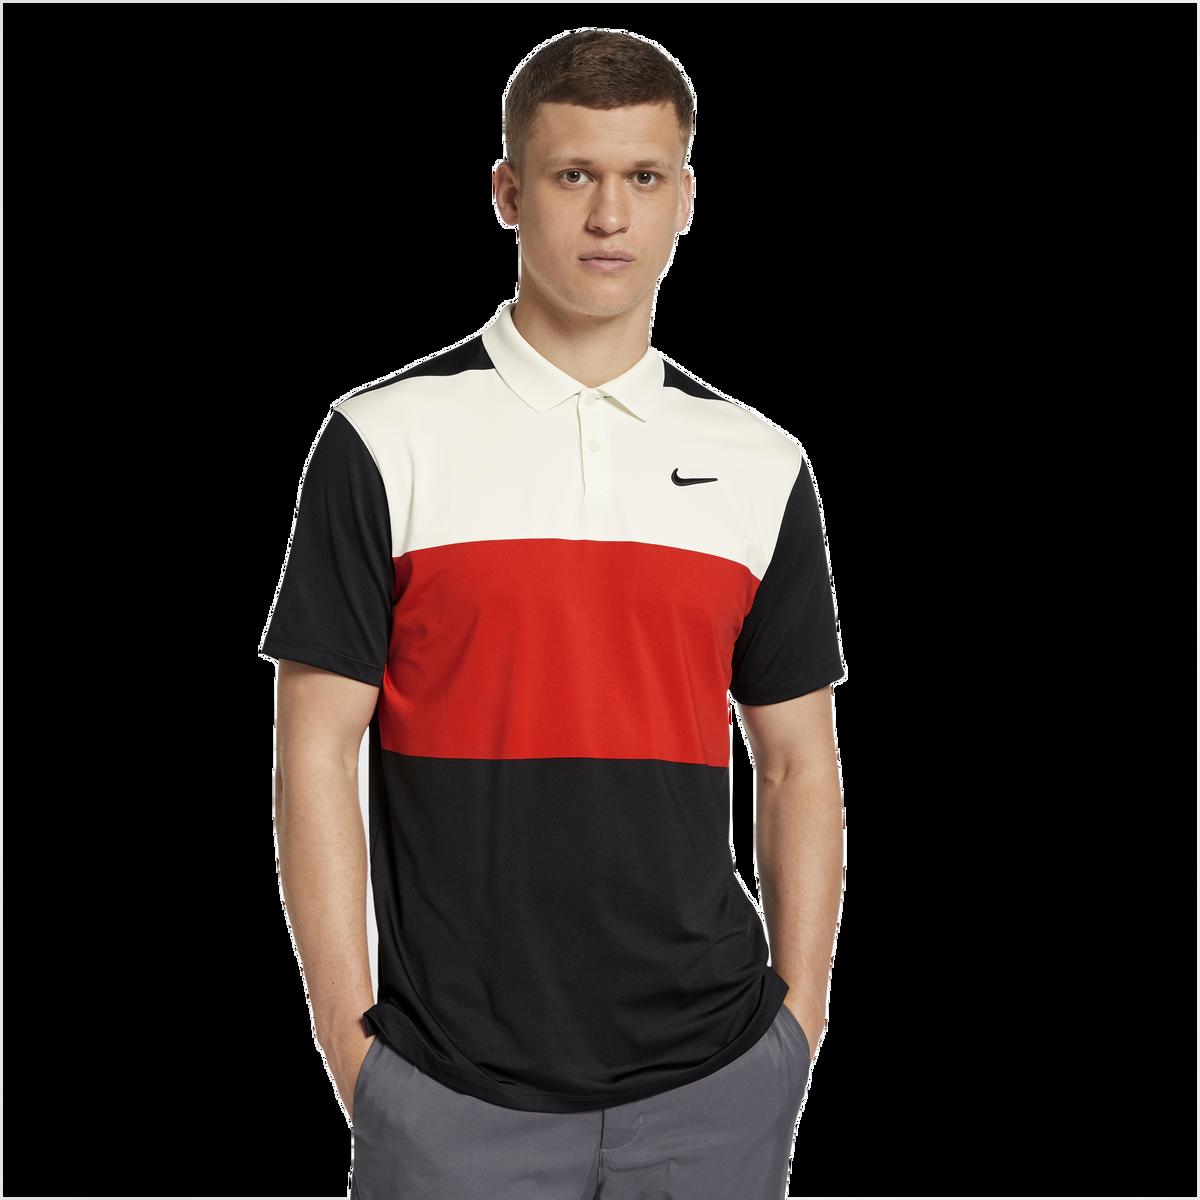 f0d1da72 Nike Dri-Fit Vapor Block Stripe Polo | PGA TOUR Superstore